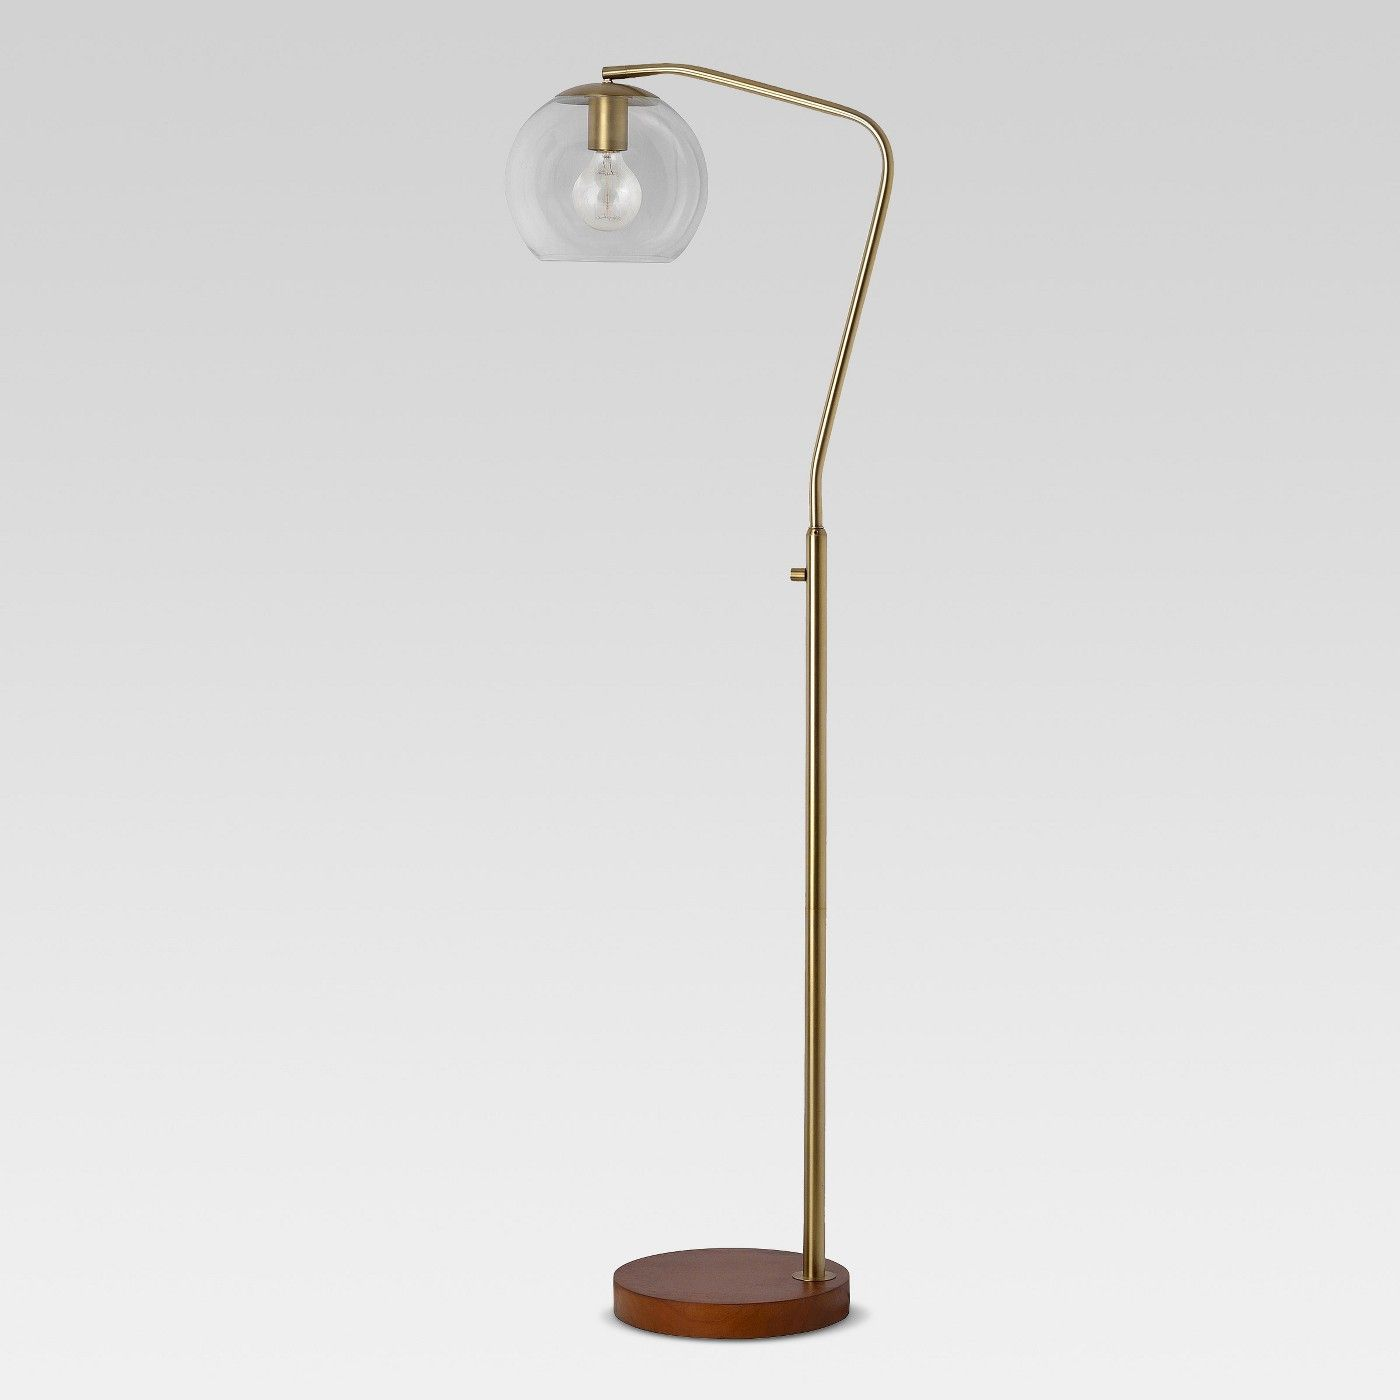 LivingRoomLamps | Mid century light fixtures, Mid century